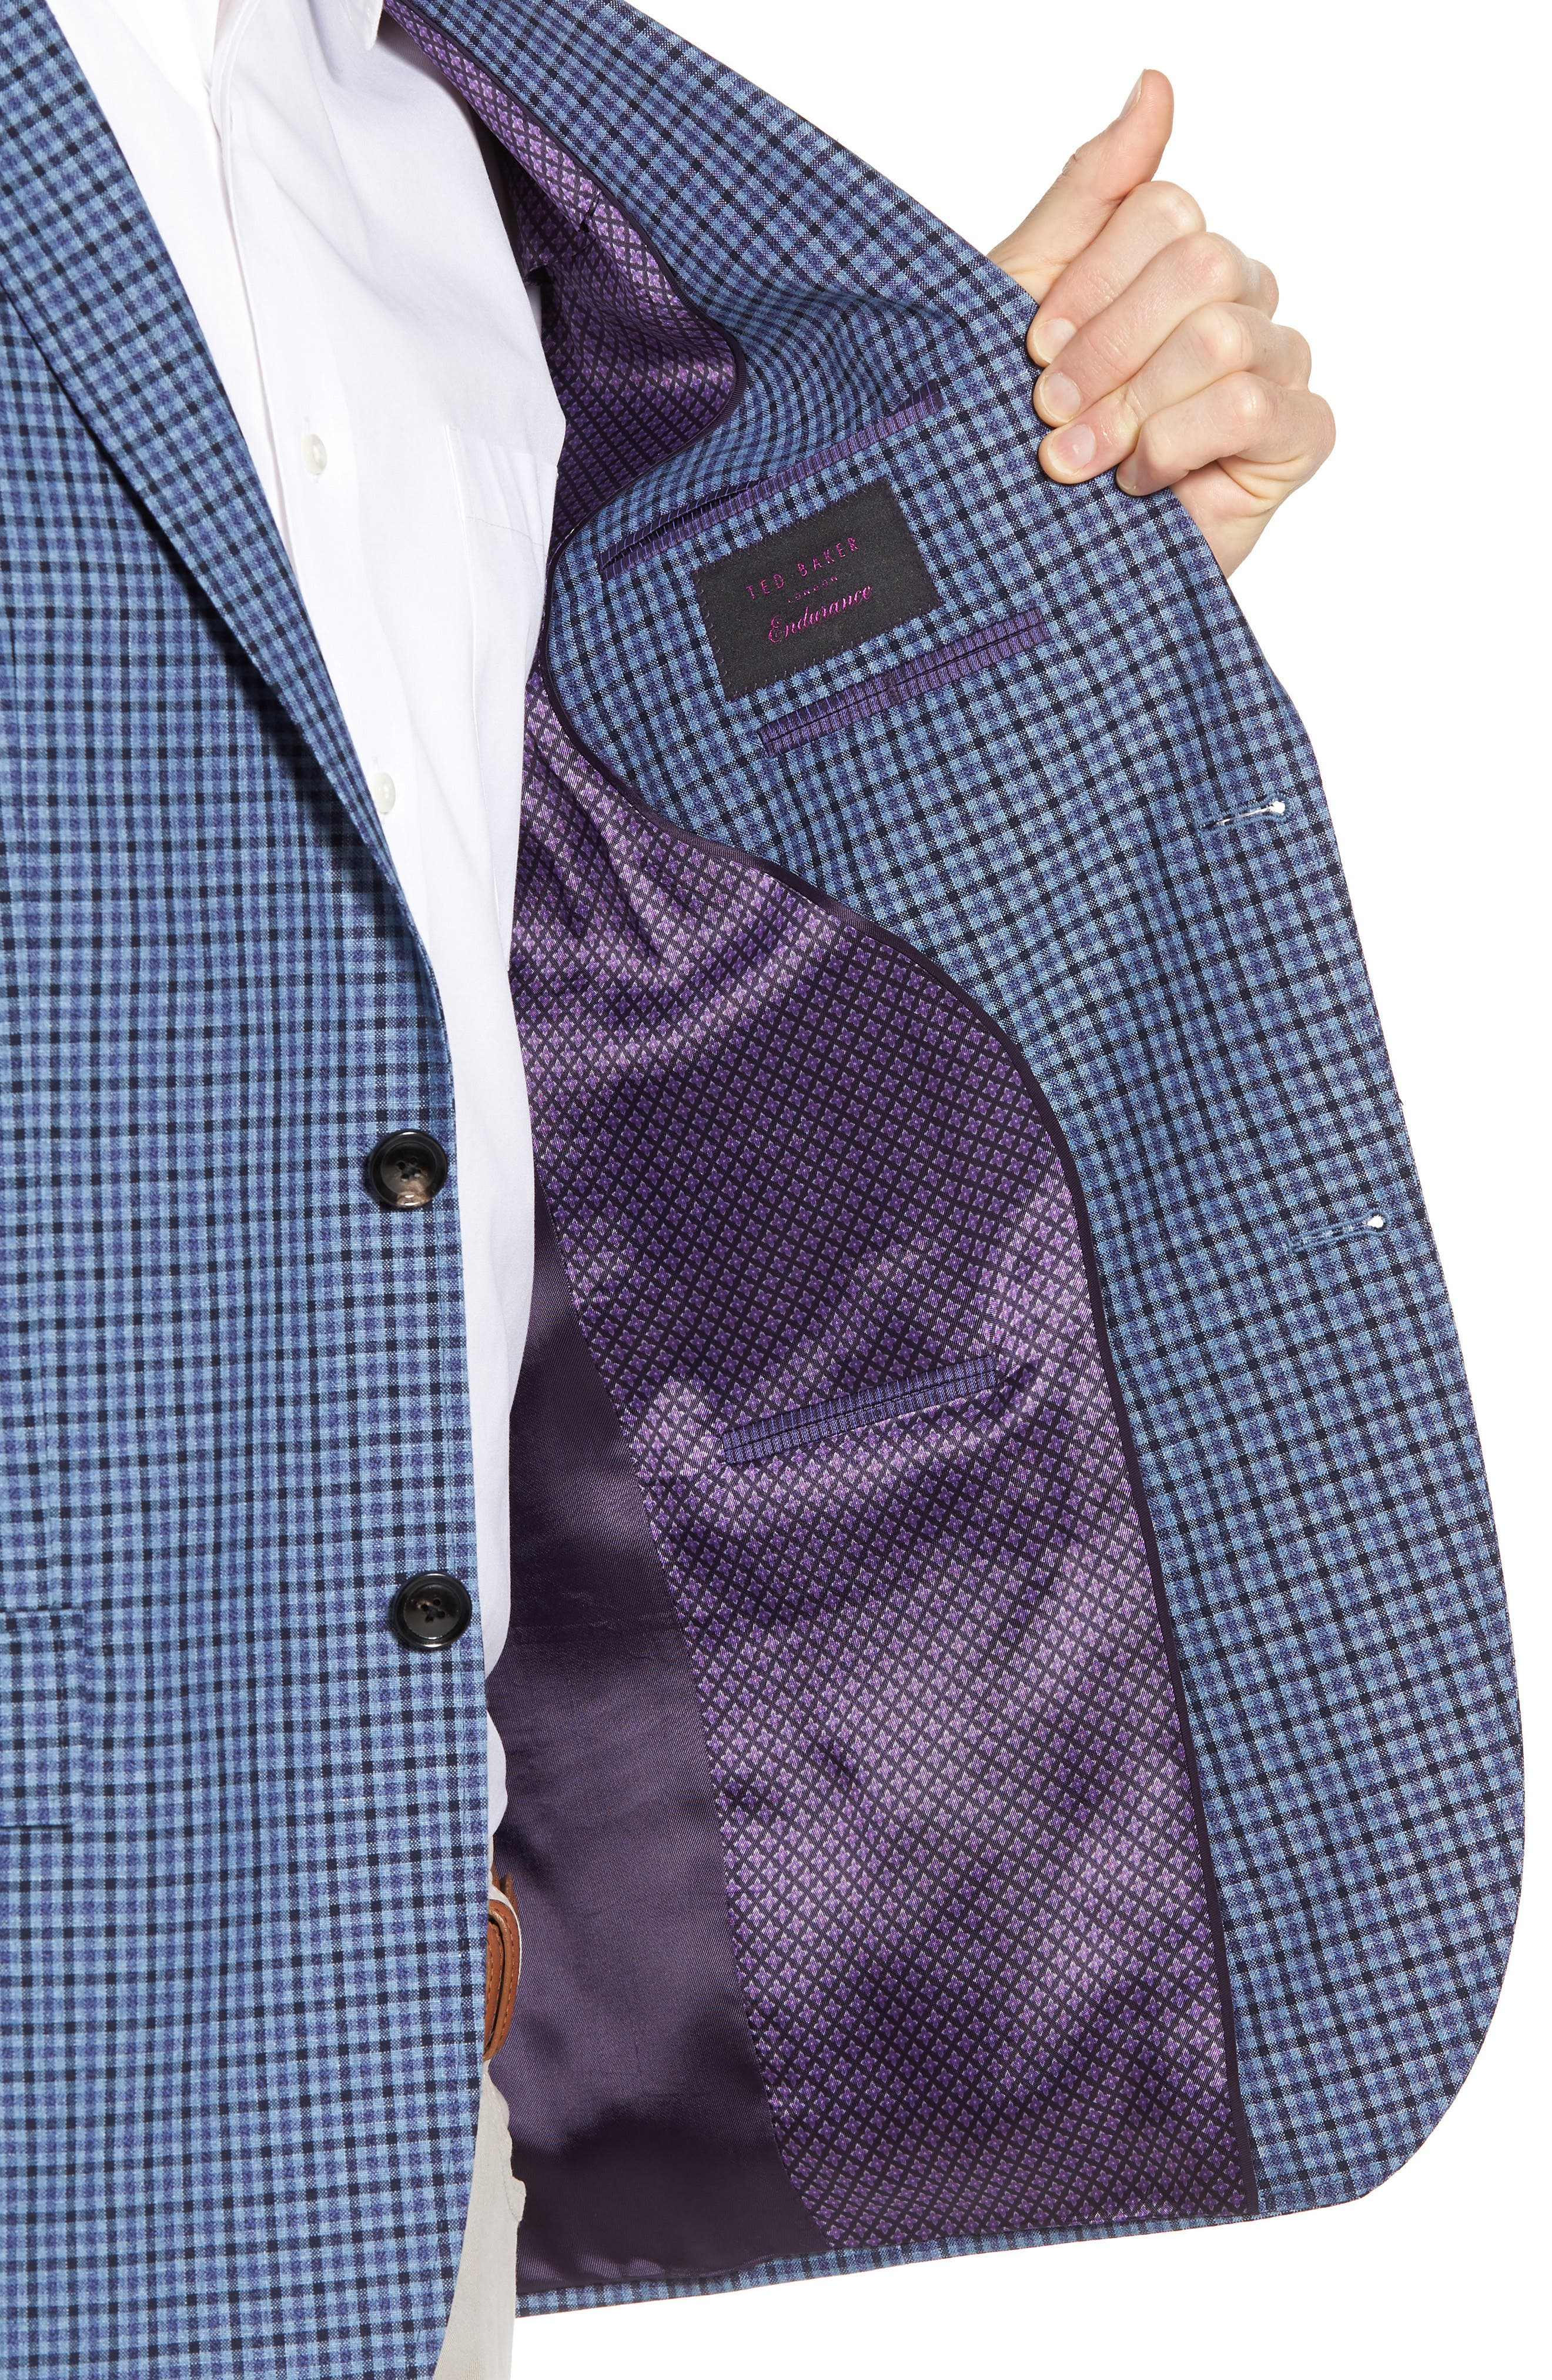 Jay Trim Fit Check Wool & Linen Sport Coat,                             Alternate thumbnail 4, color,                             Blue